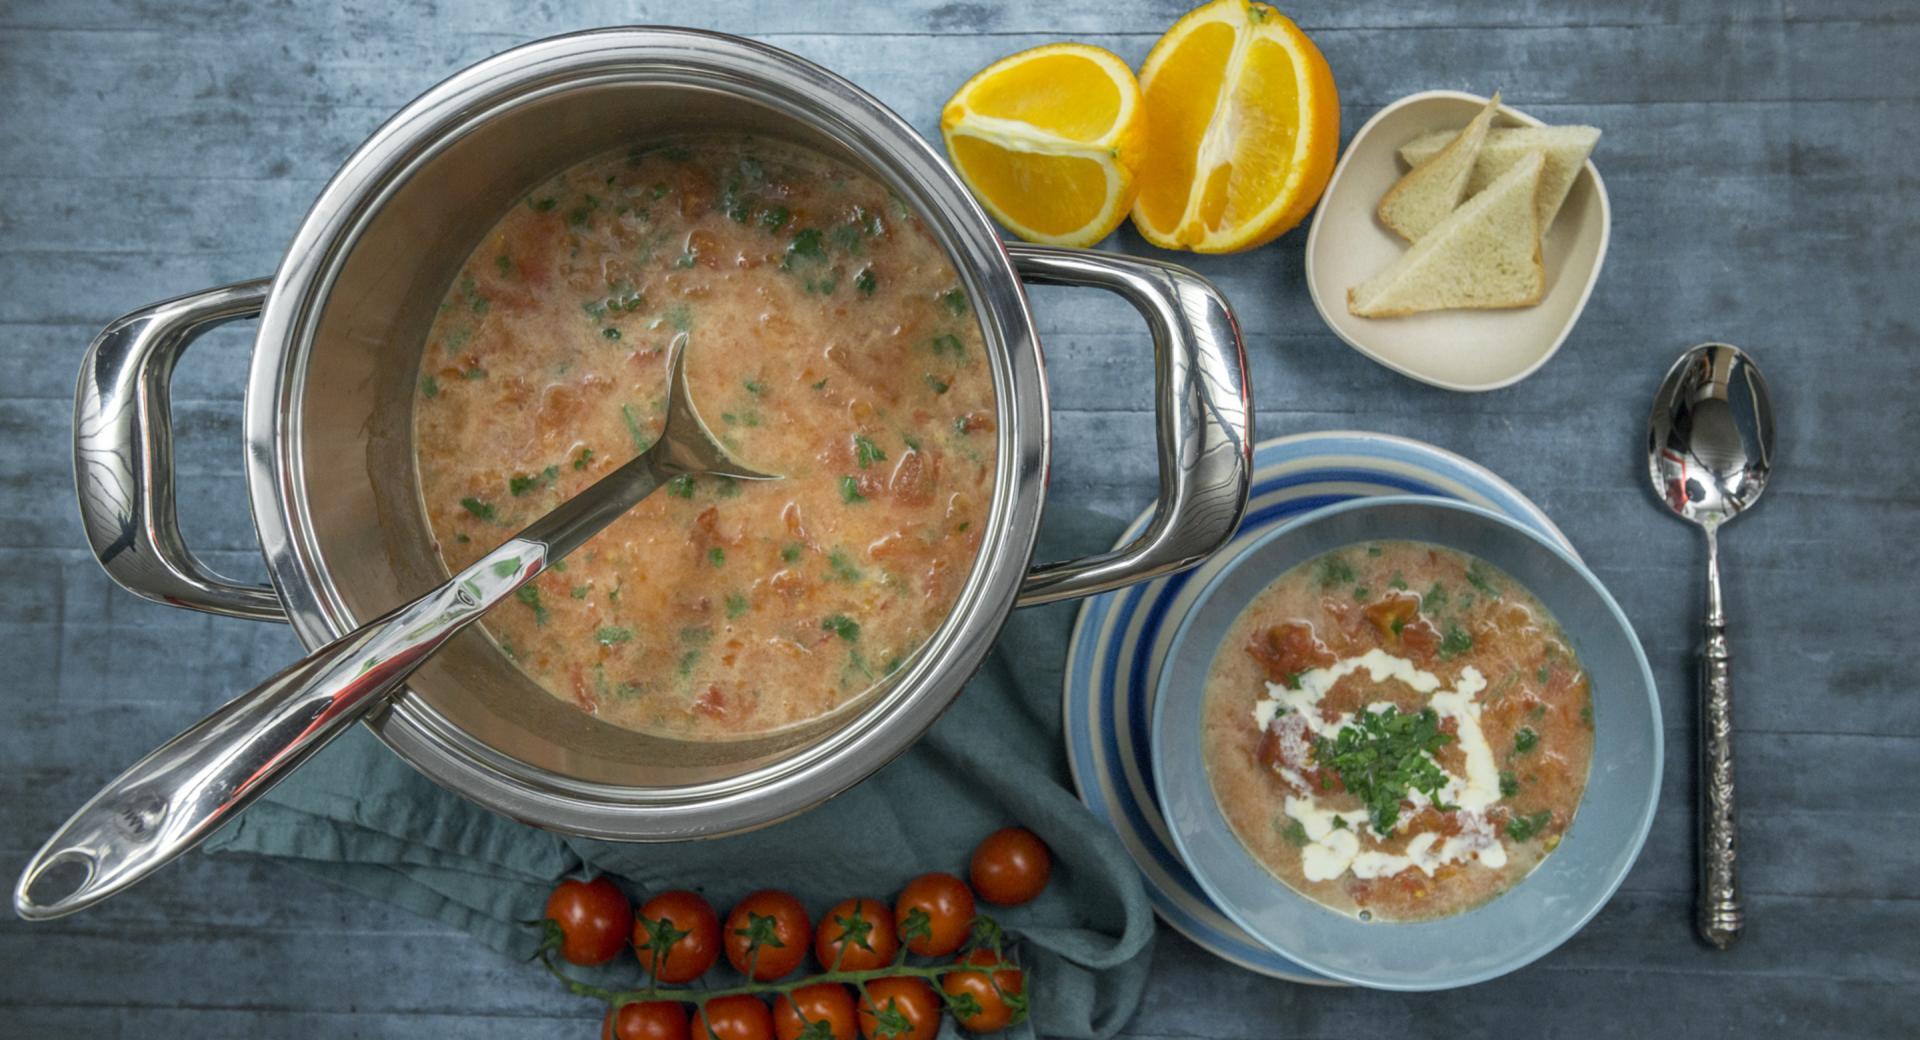 Sopa de tomate con naranja